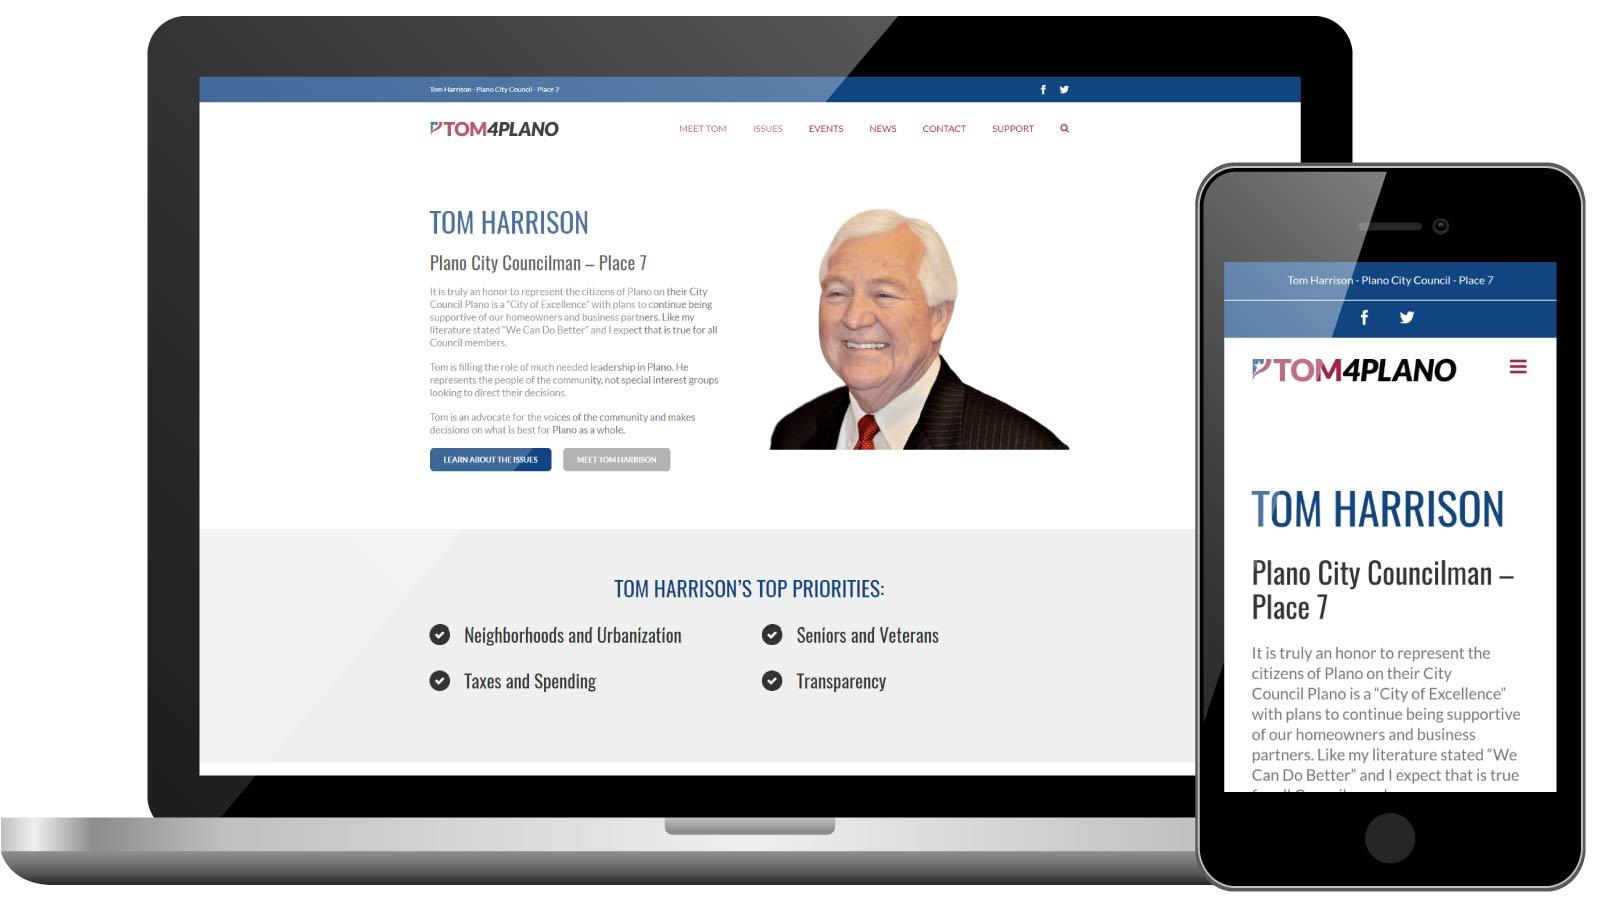 Tom Harrison Website Design for Plano City Council Race